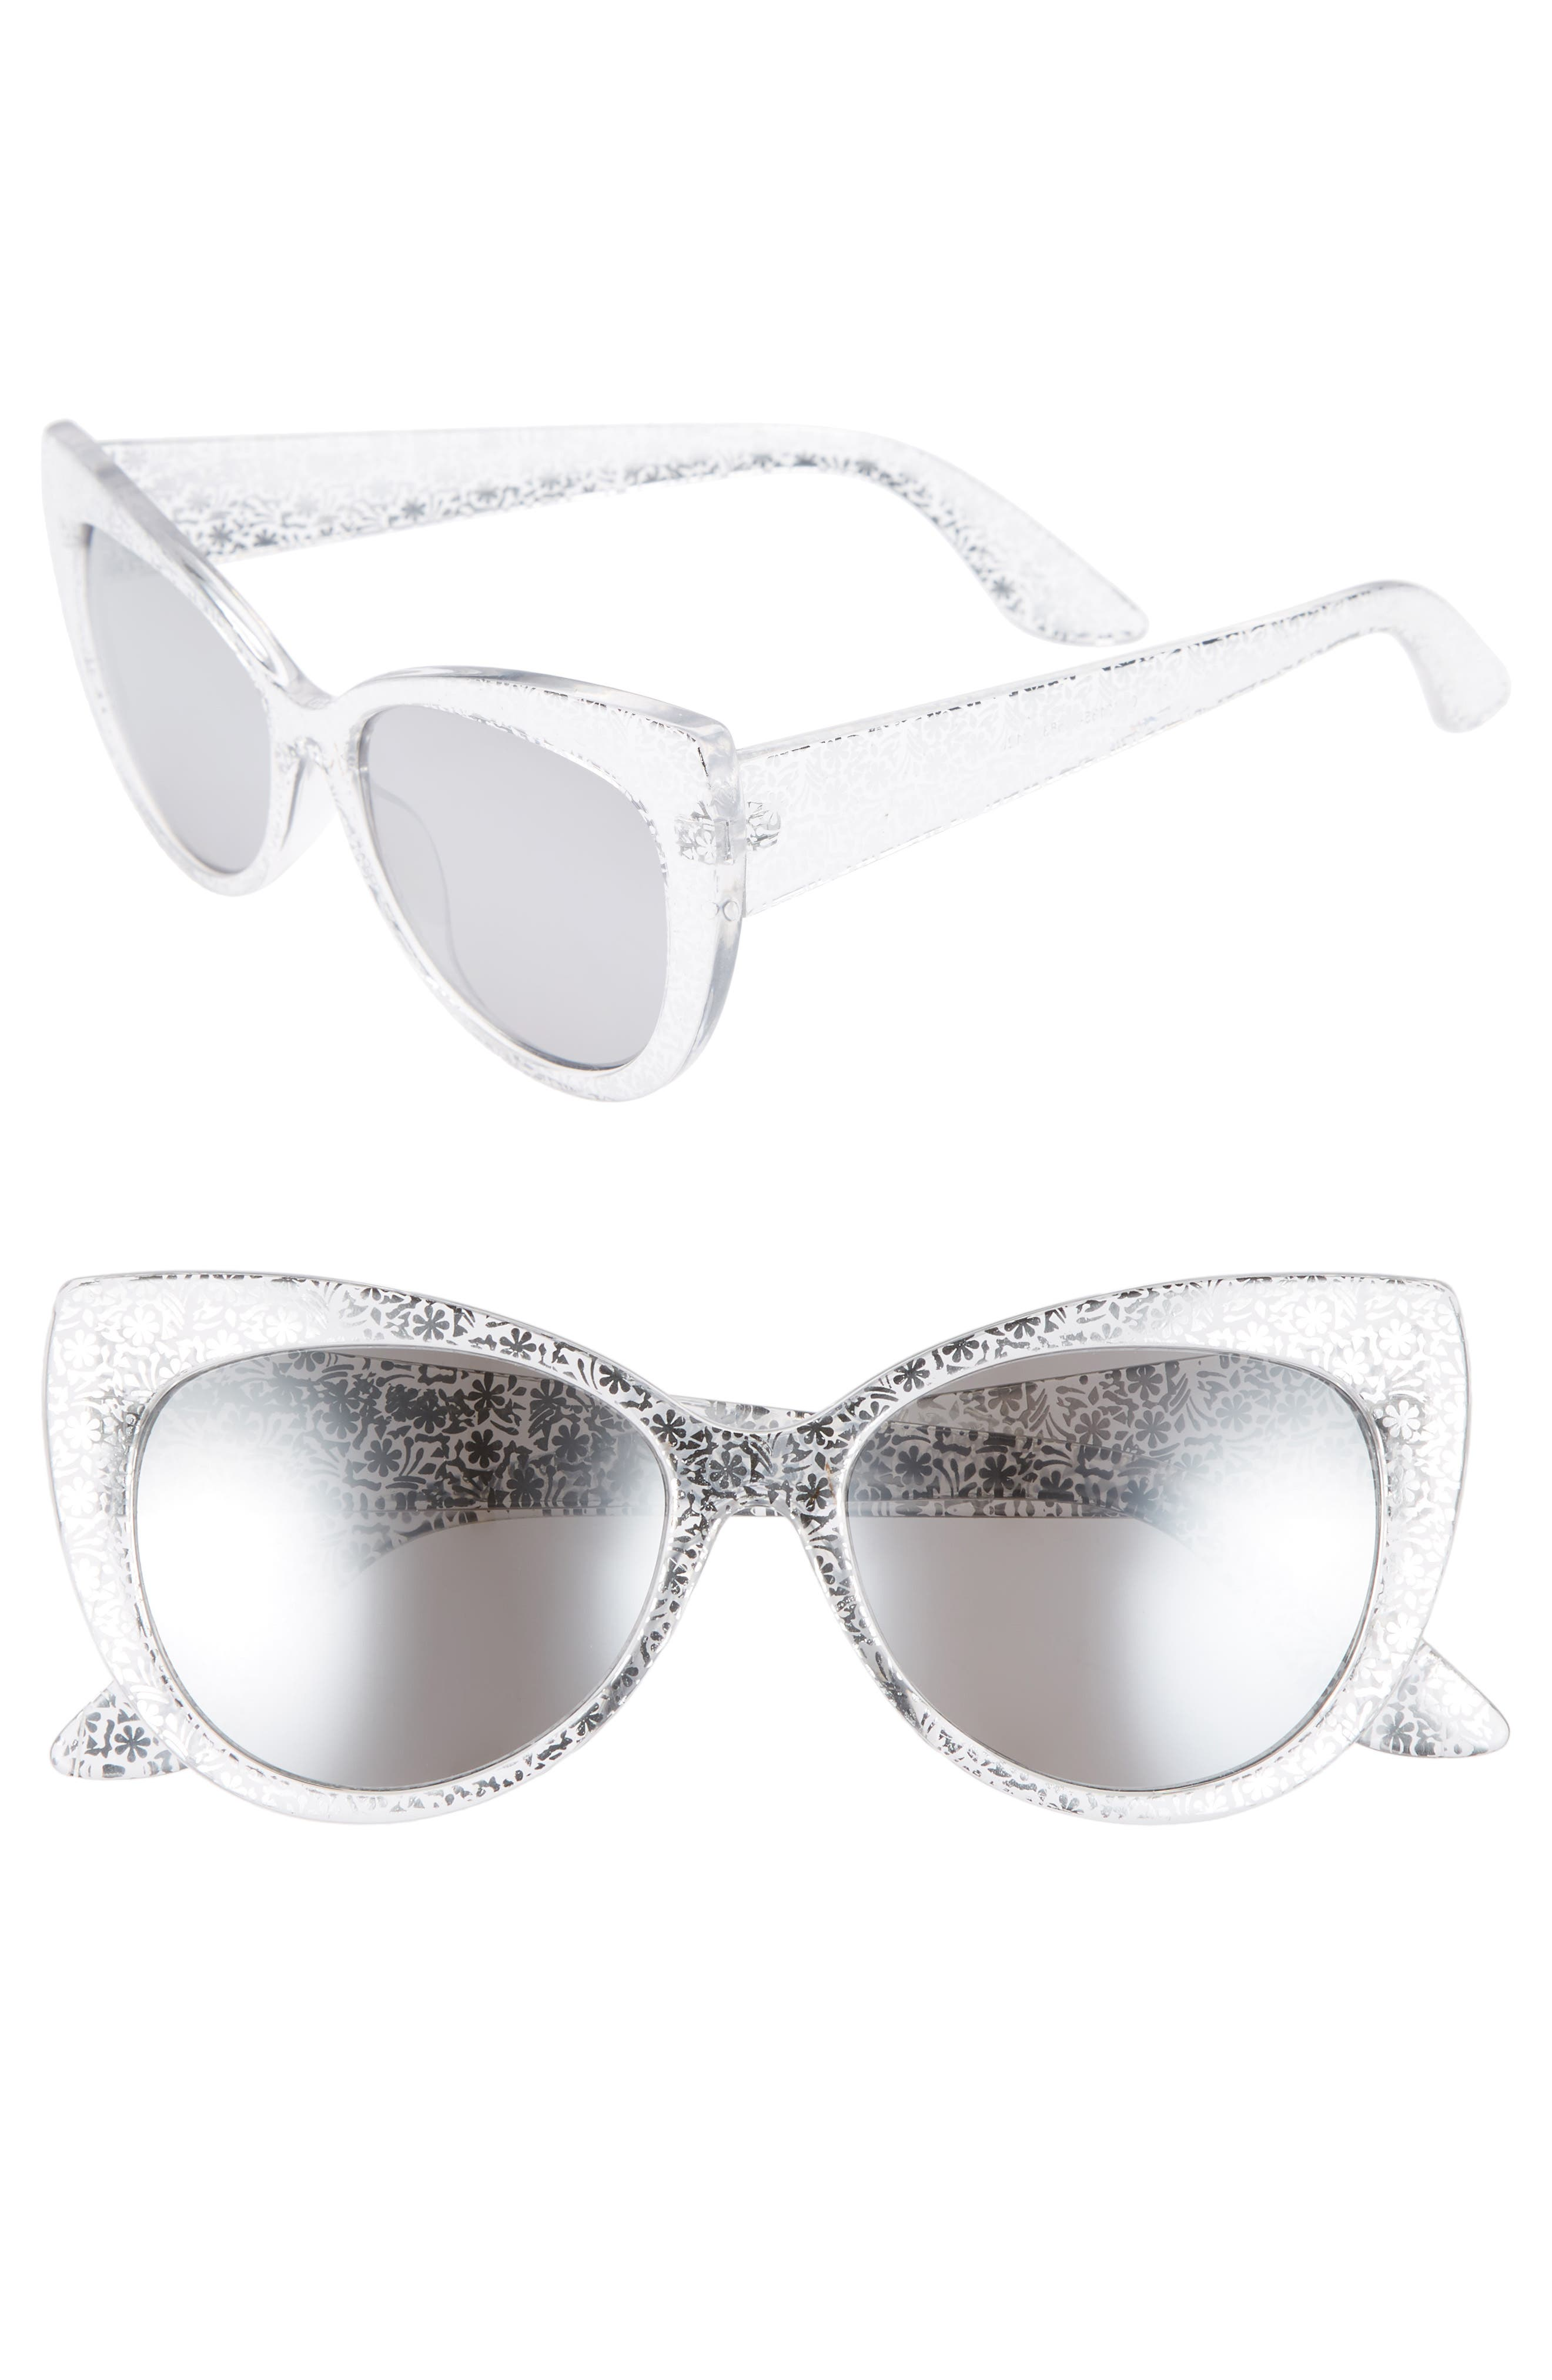 55mm Floral Cat Eye Sunglasses,                         Main,                         color,